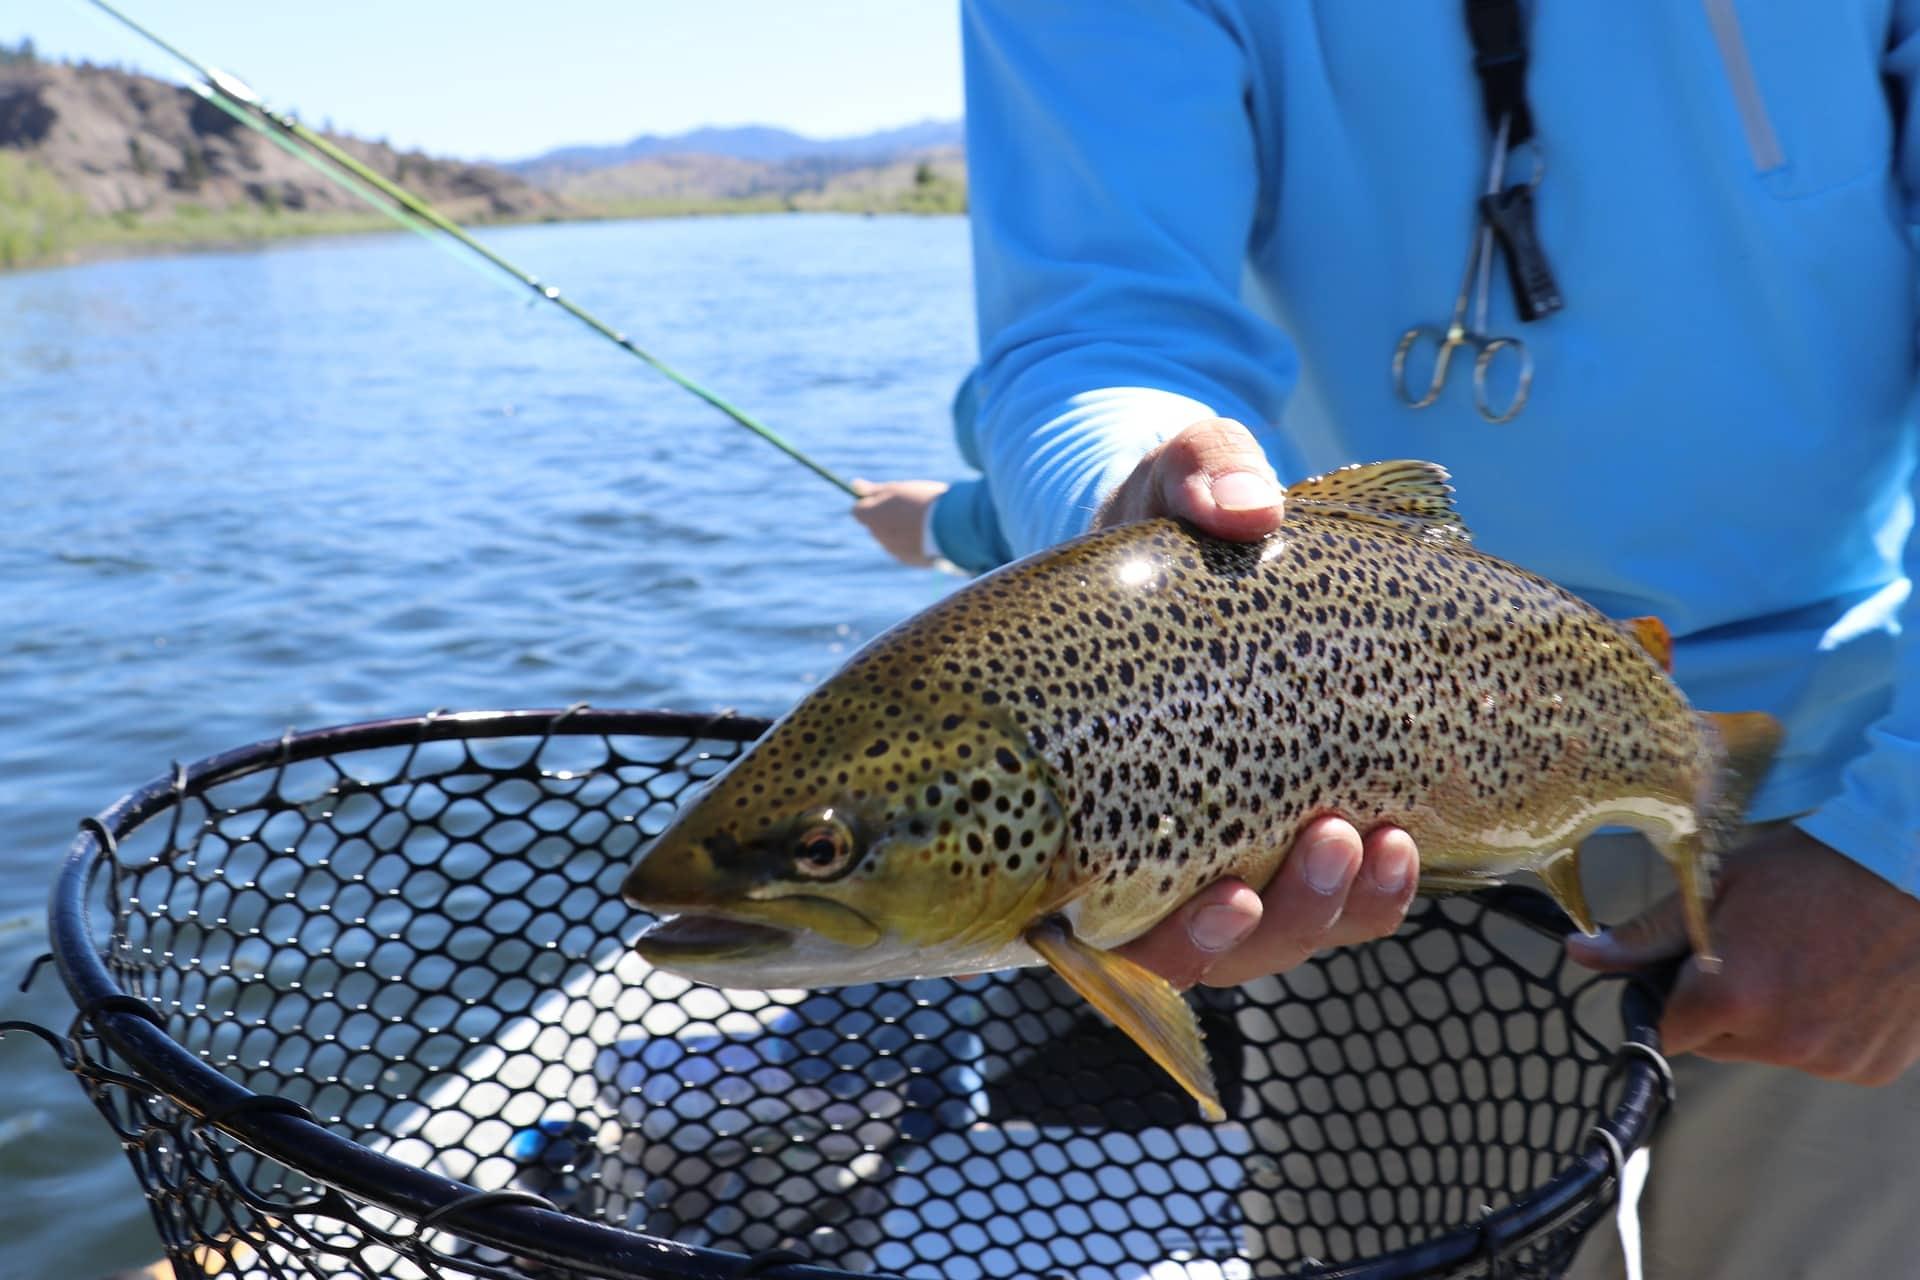 15 of the Best Fishing Spots in New Zealand